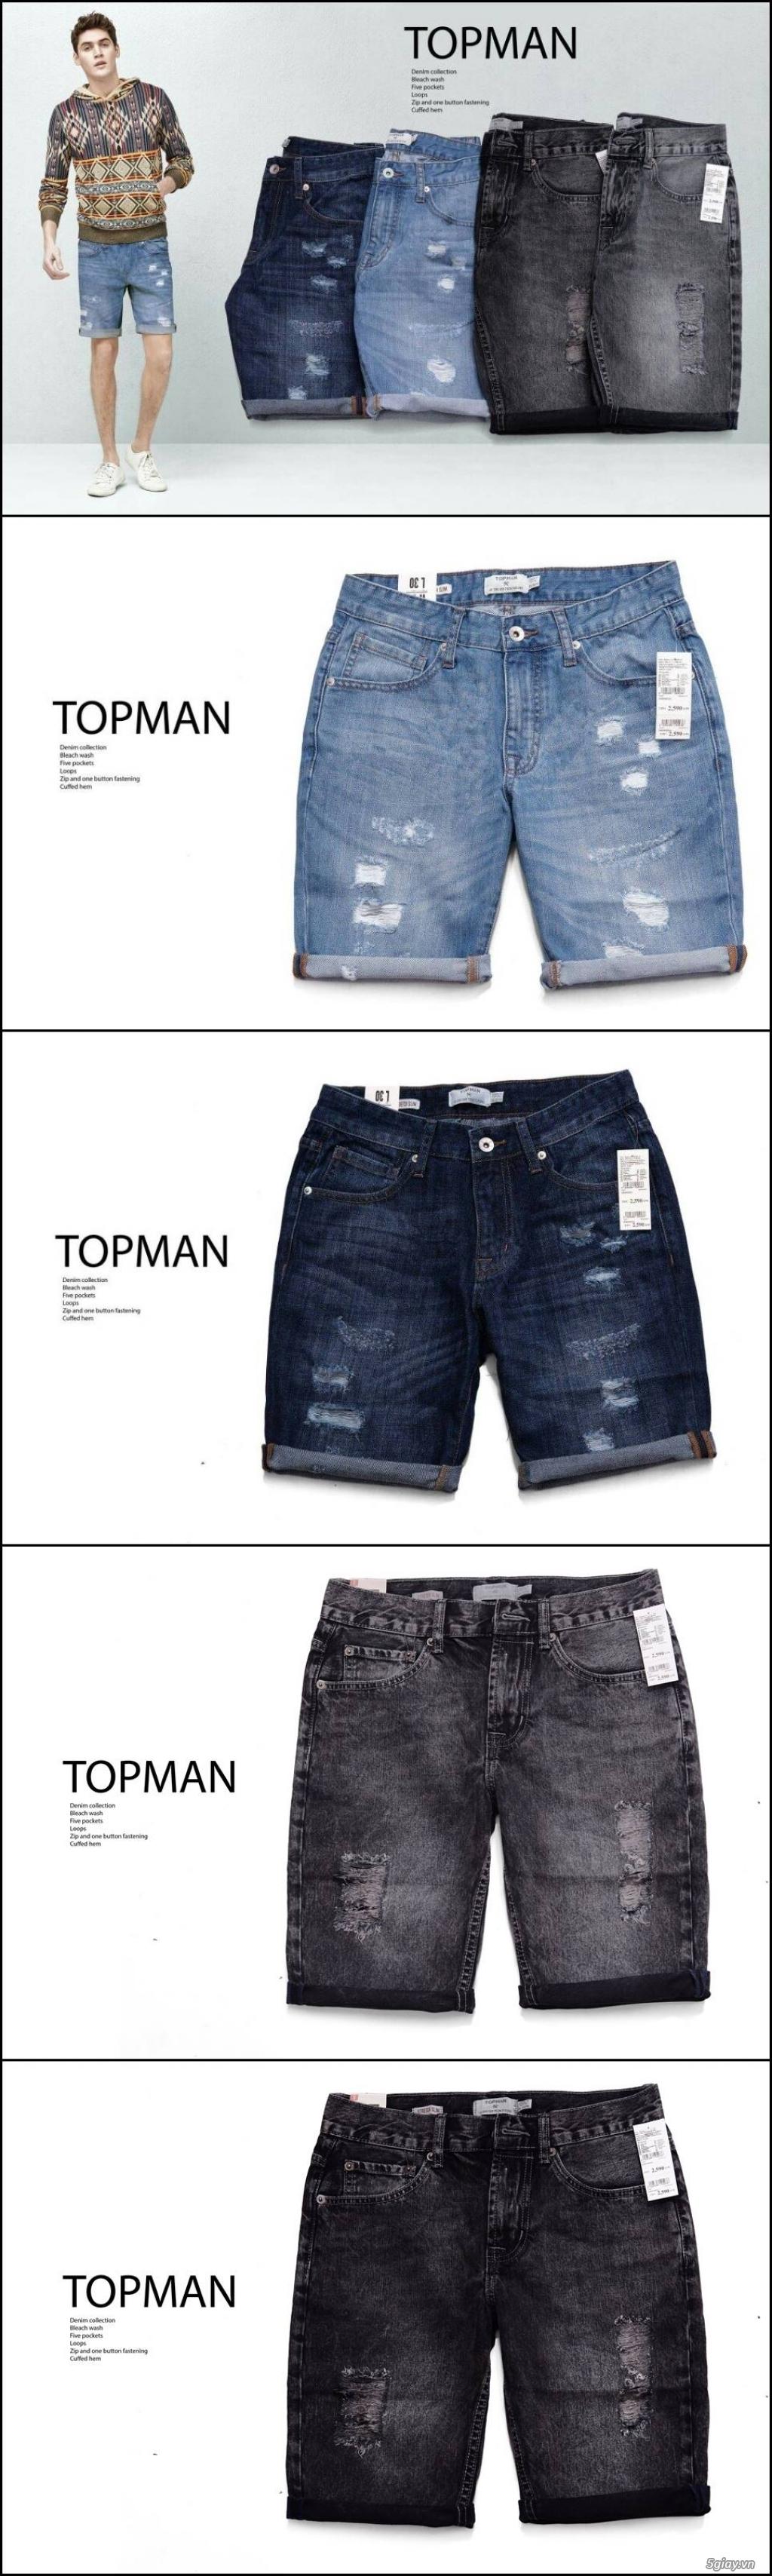 Shop285.com - Shop quần áo : Zara,Jules,Jake*s,,Hollister,Aber,CK,Tommy,Levis - 1